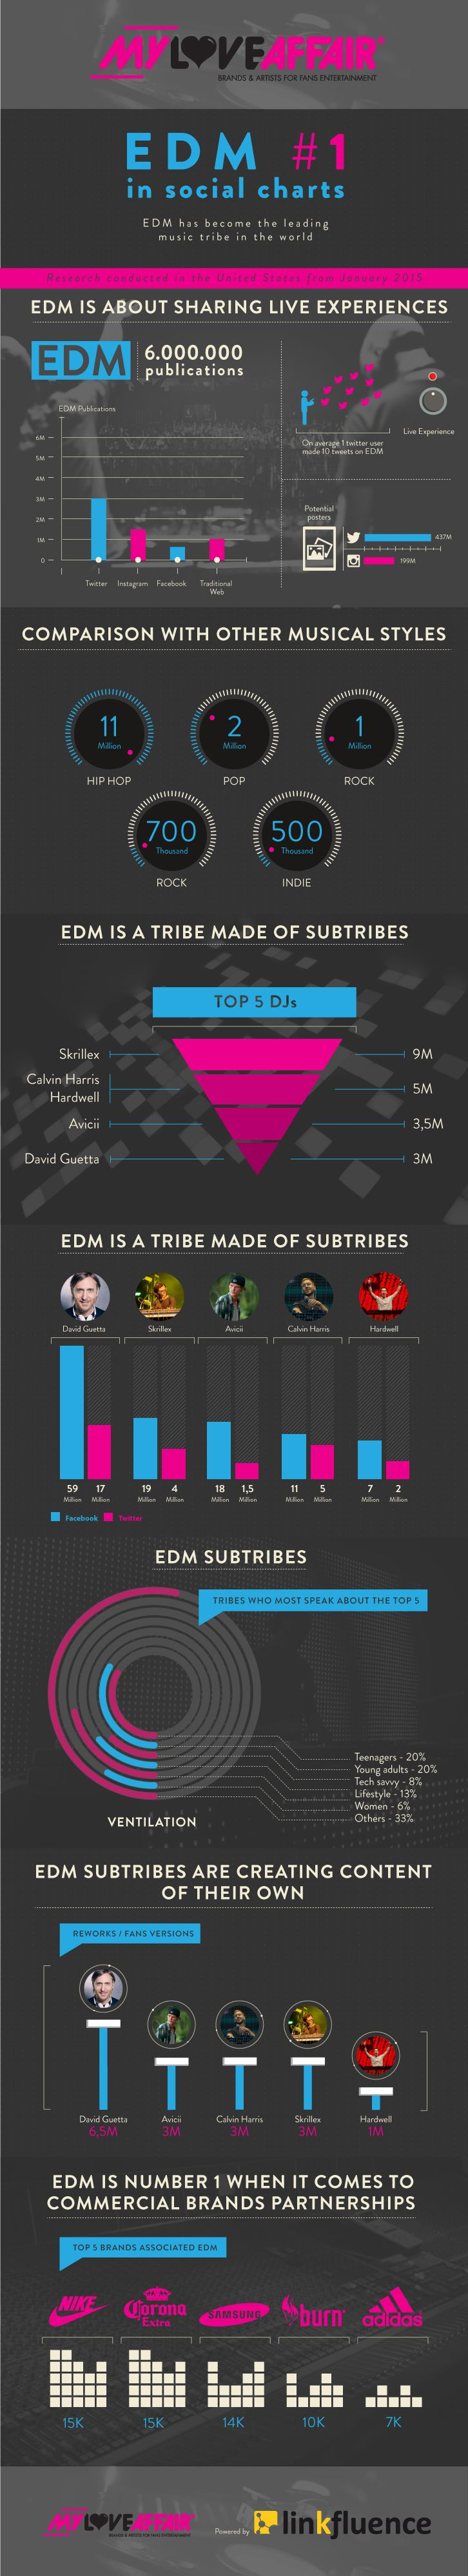 EDM In Social Media in 2015 Infographic EDM World